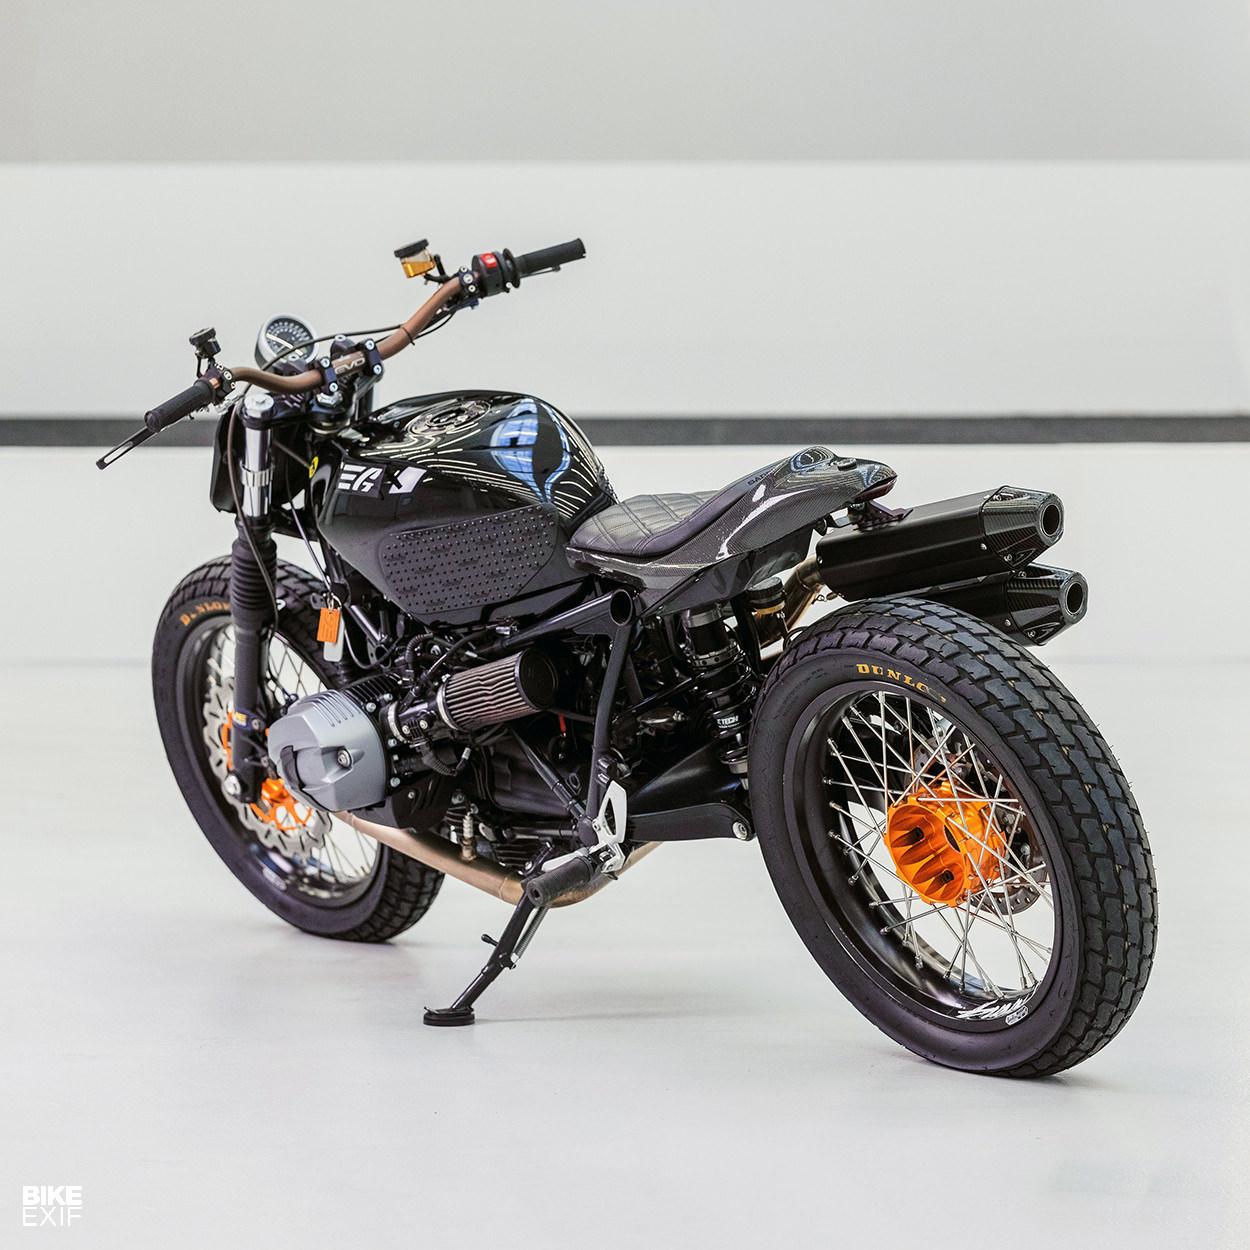 bmw-flat-track-motorcycle-6.jpg